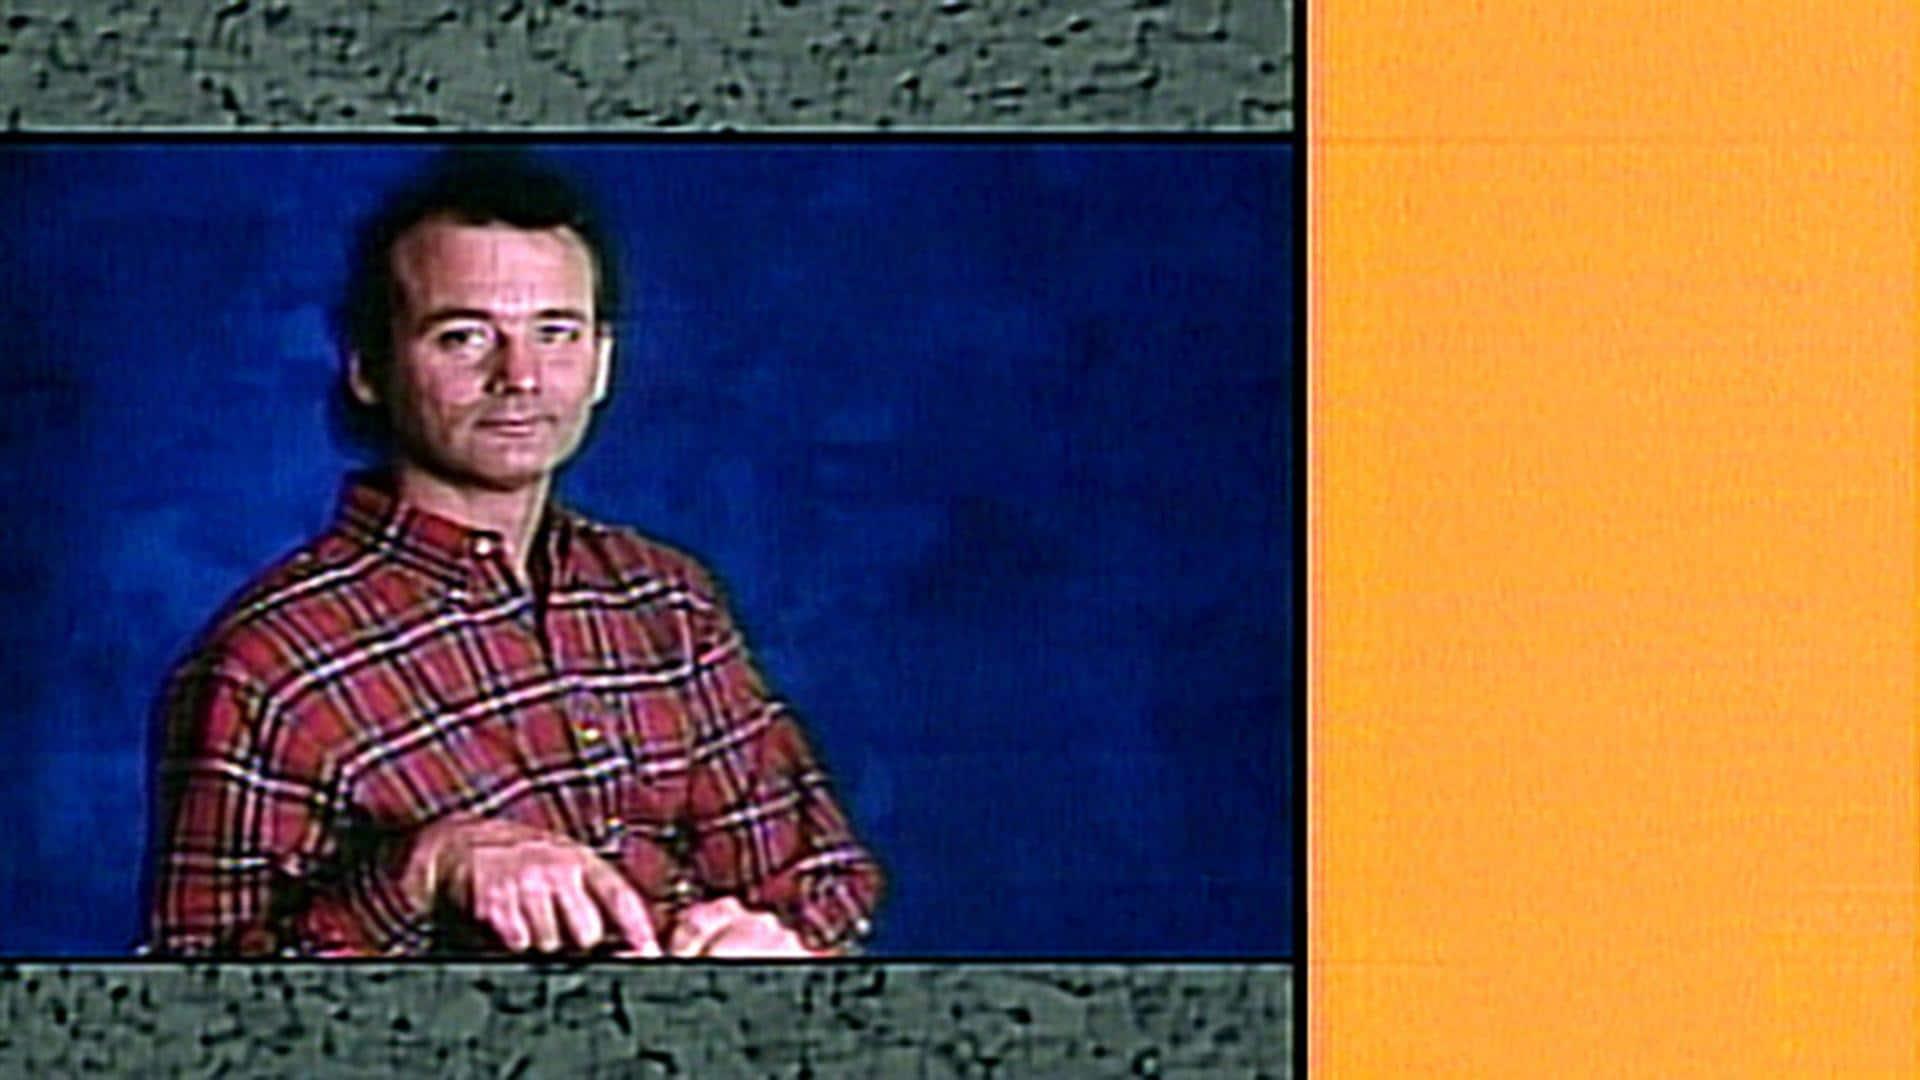 Bill Murray: March 21, 1987